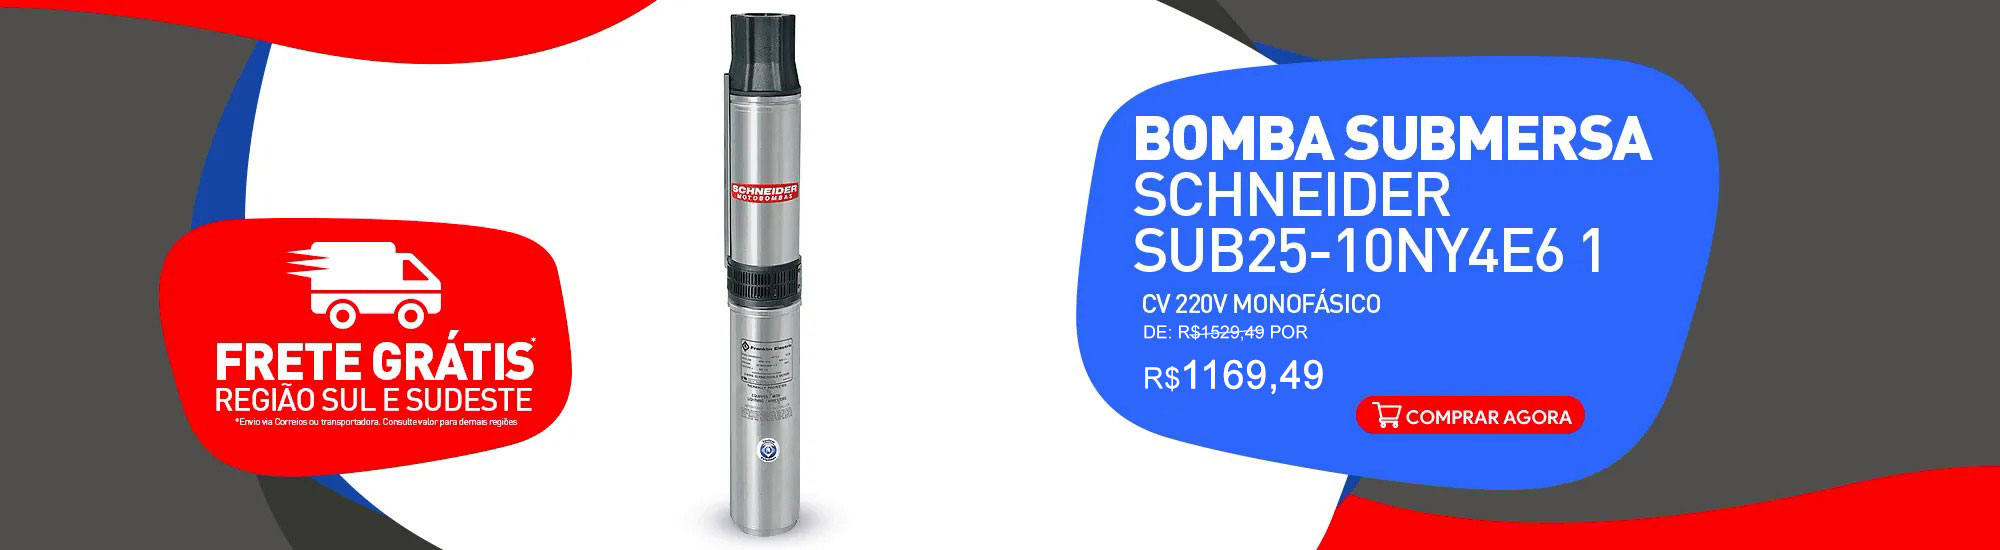 BOMBA SUBMERSA SCHNEIDER SUB25-10NY4E6 1 CV 220V MONOFÁSICO